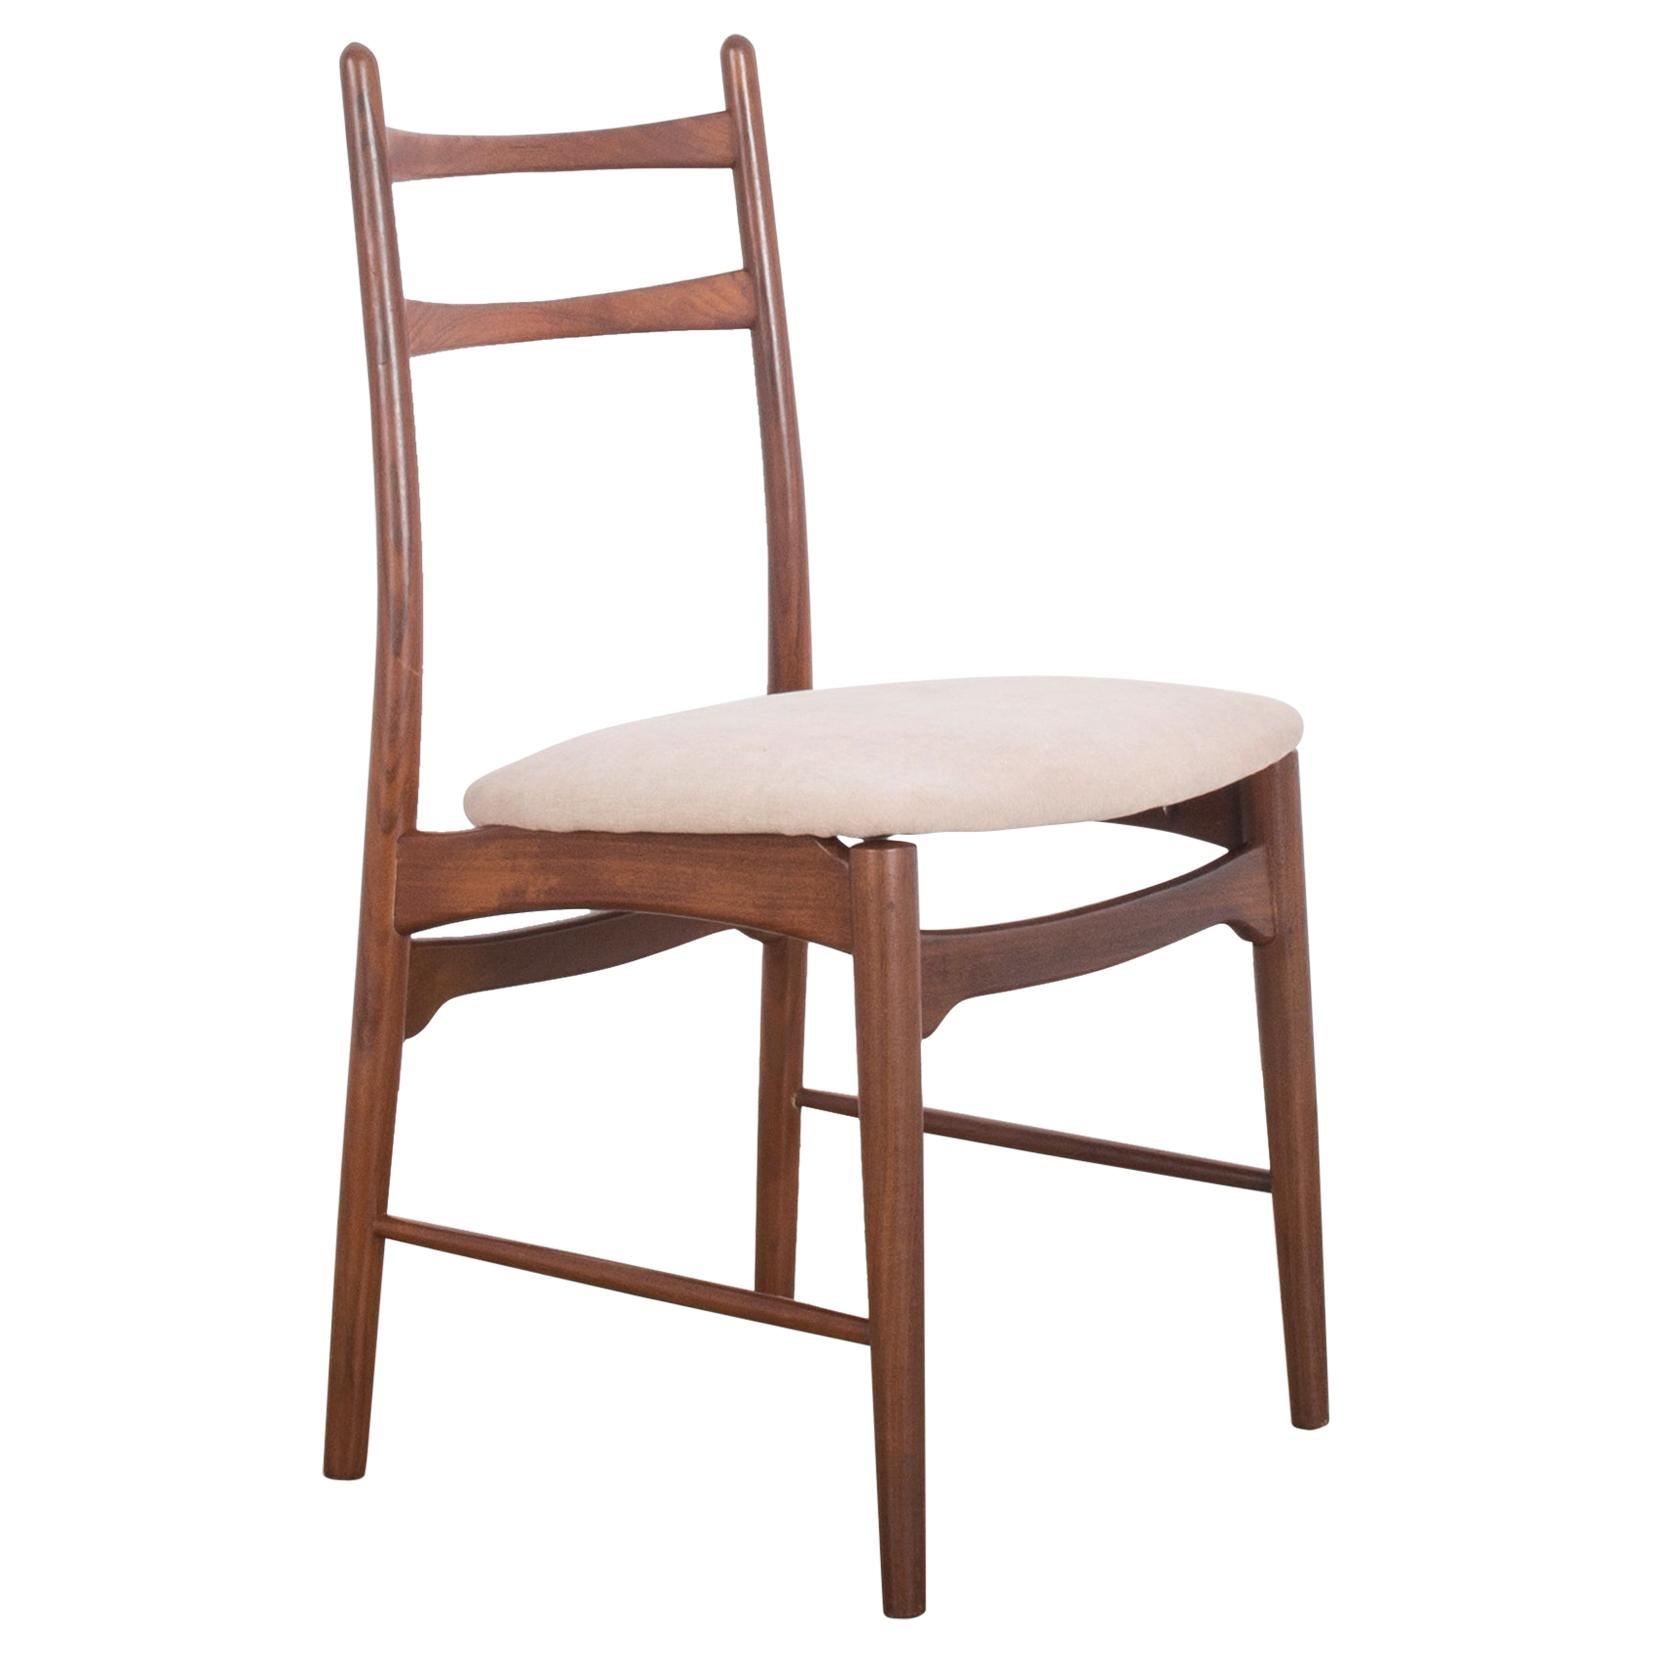 1960s Danish Teak Chair